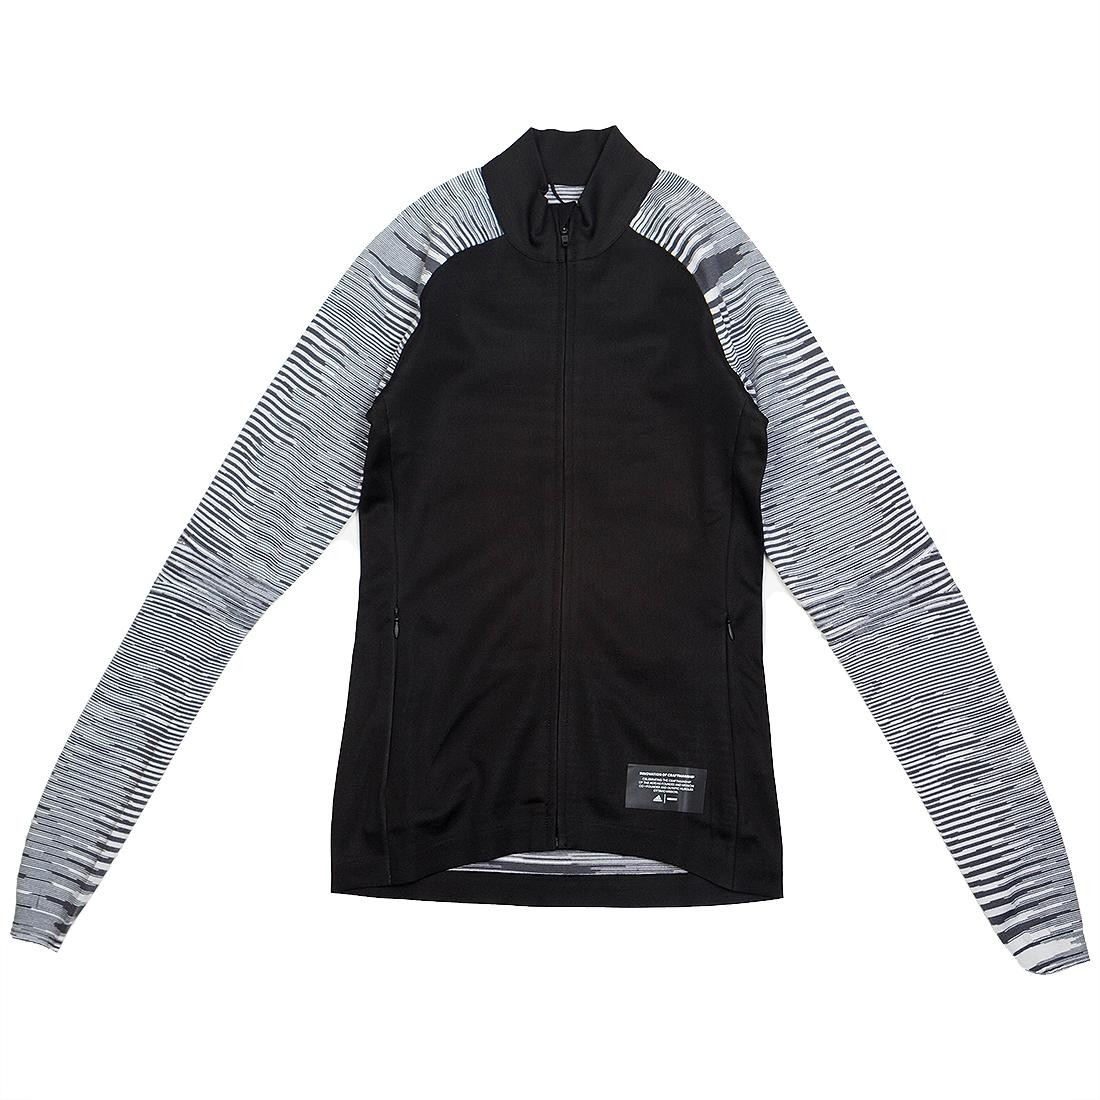 Adidas x Missoni Women PHX Jacket (black / dark grey / white)